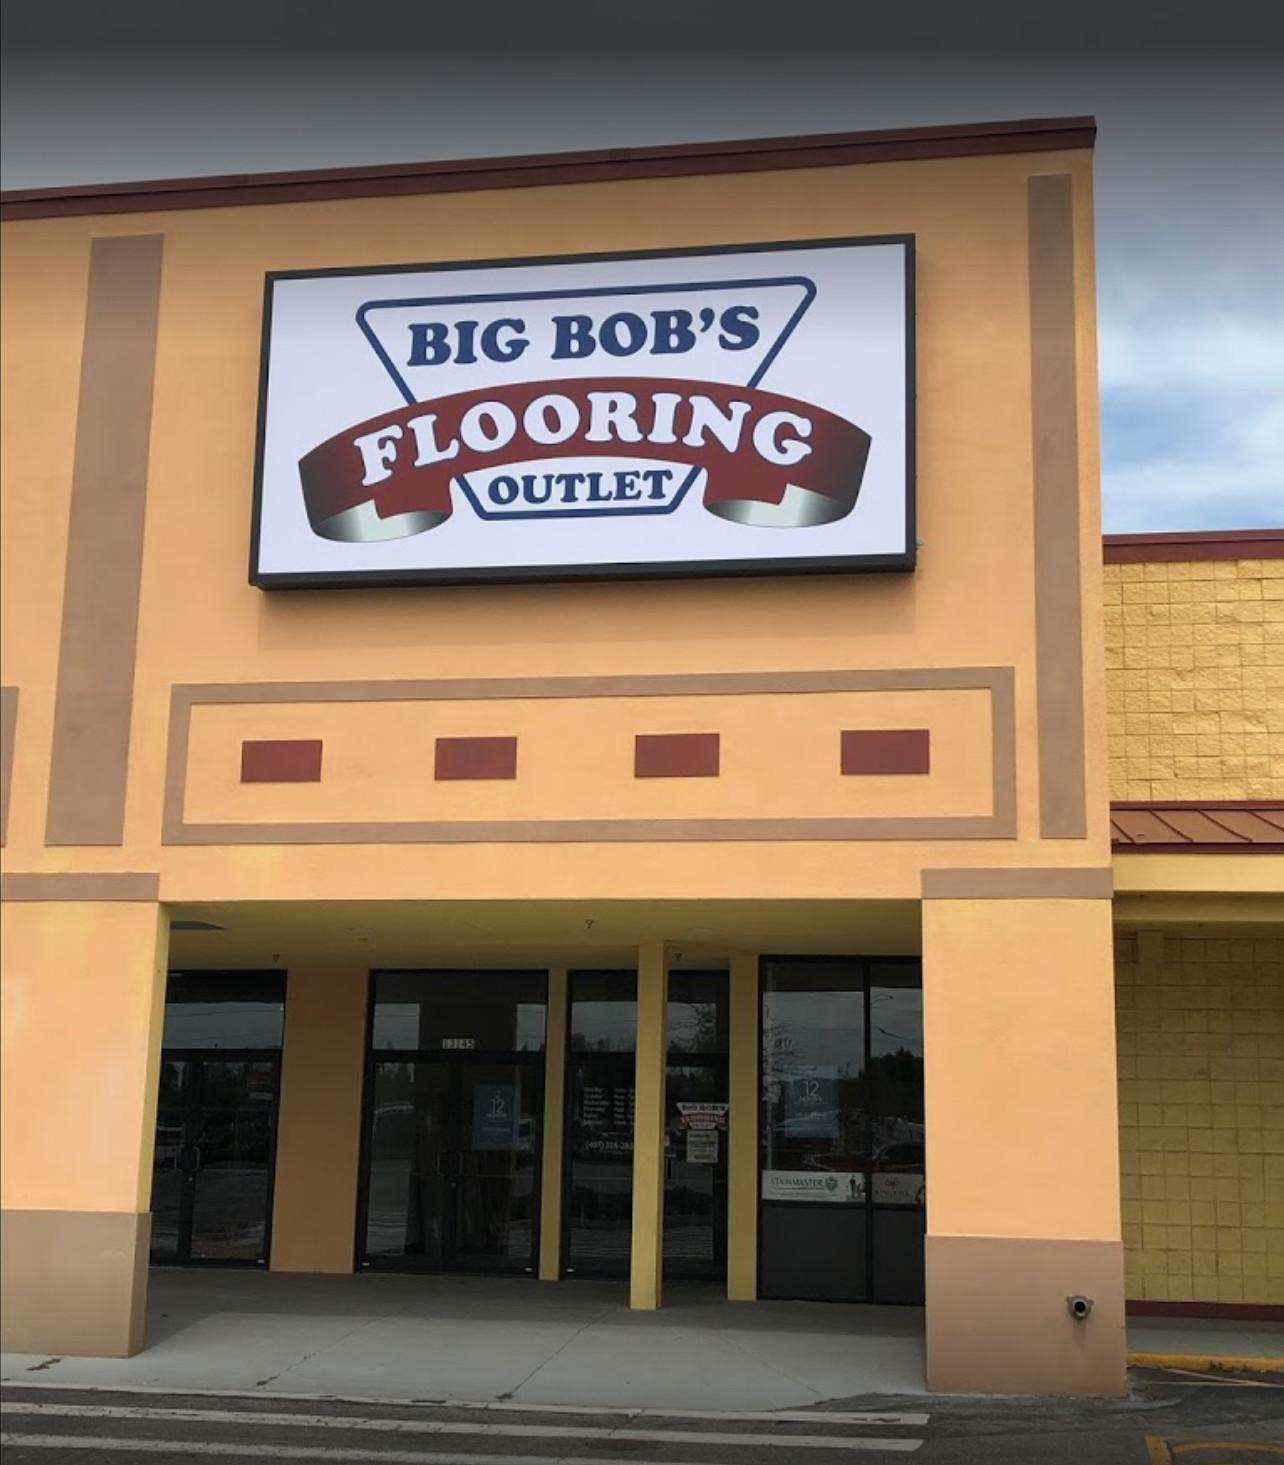 Big Bob's Flooring Outlet - 13145 W Colonial Dr, Winter Garden, FL 34787